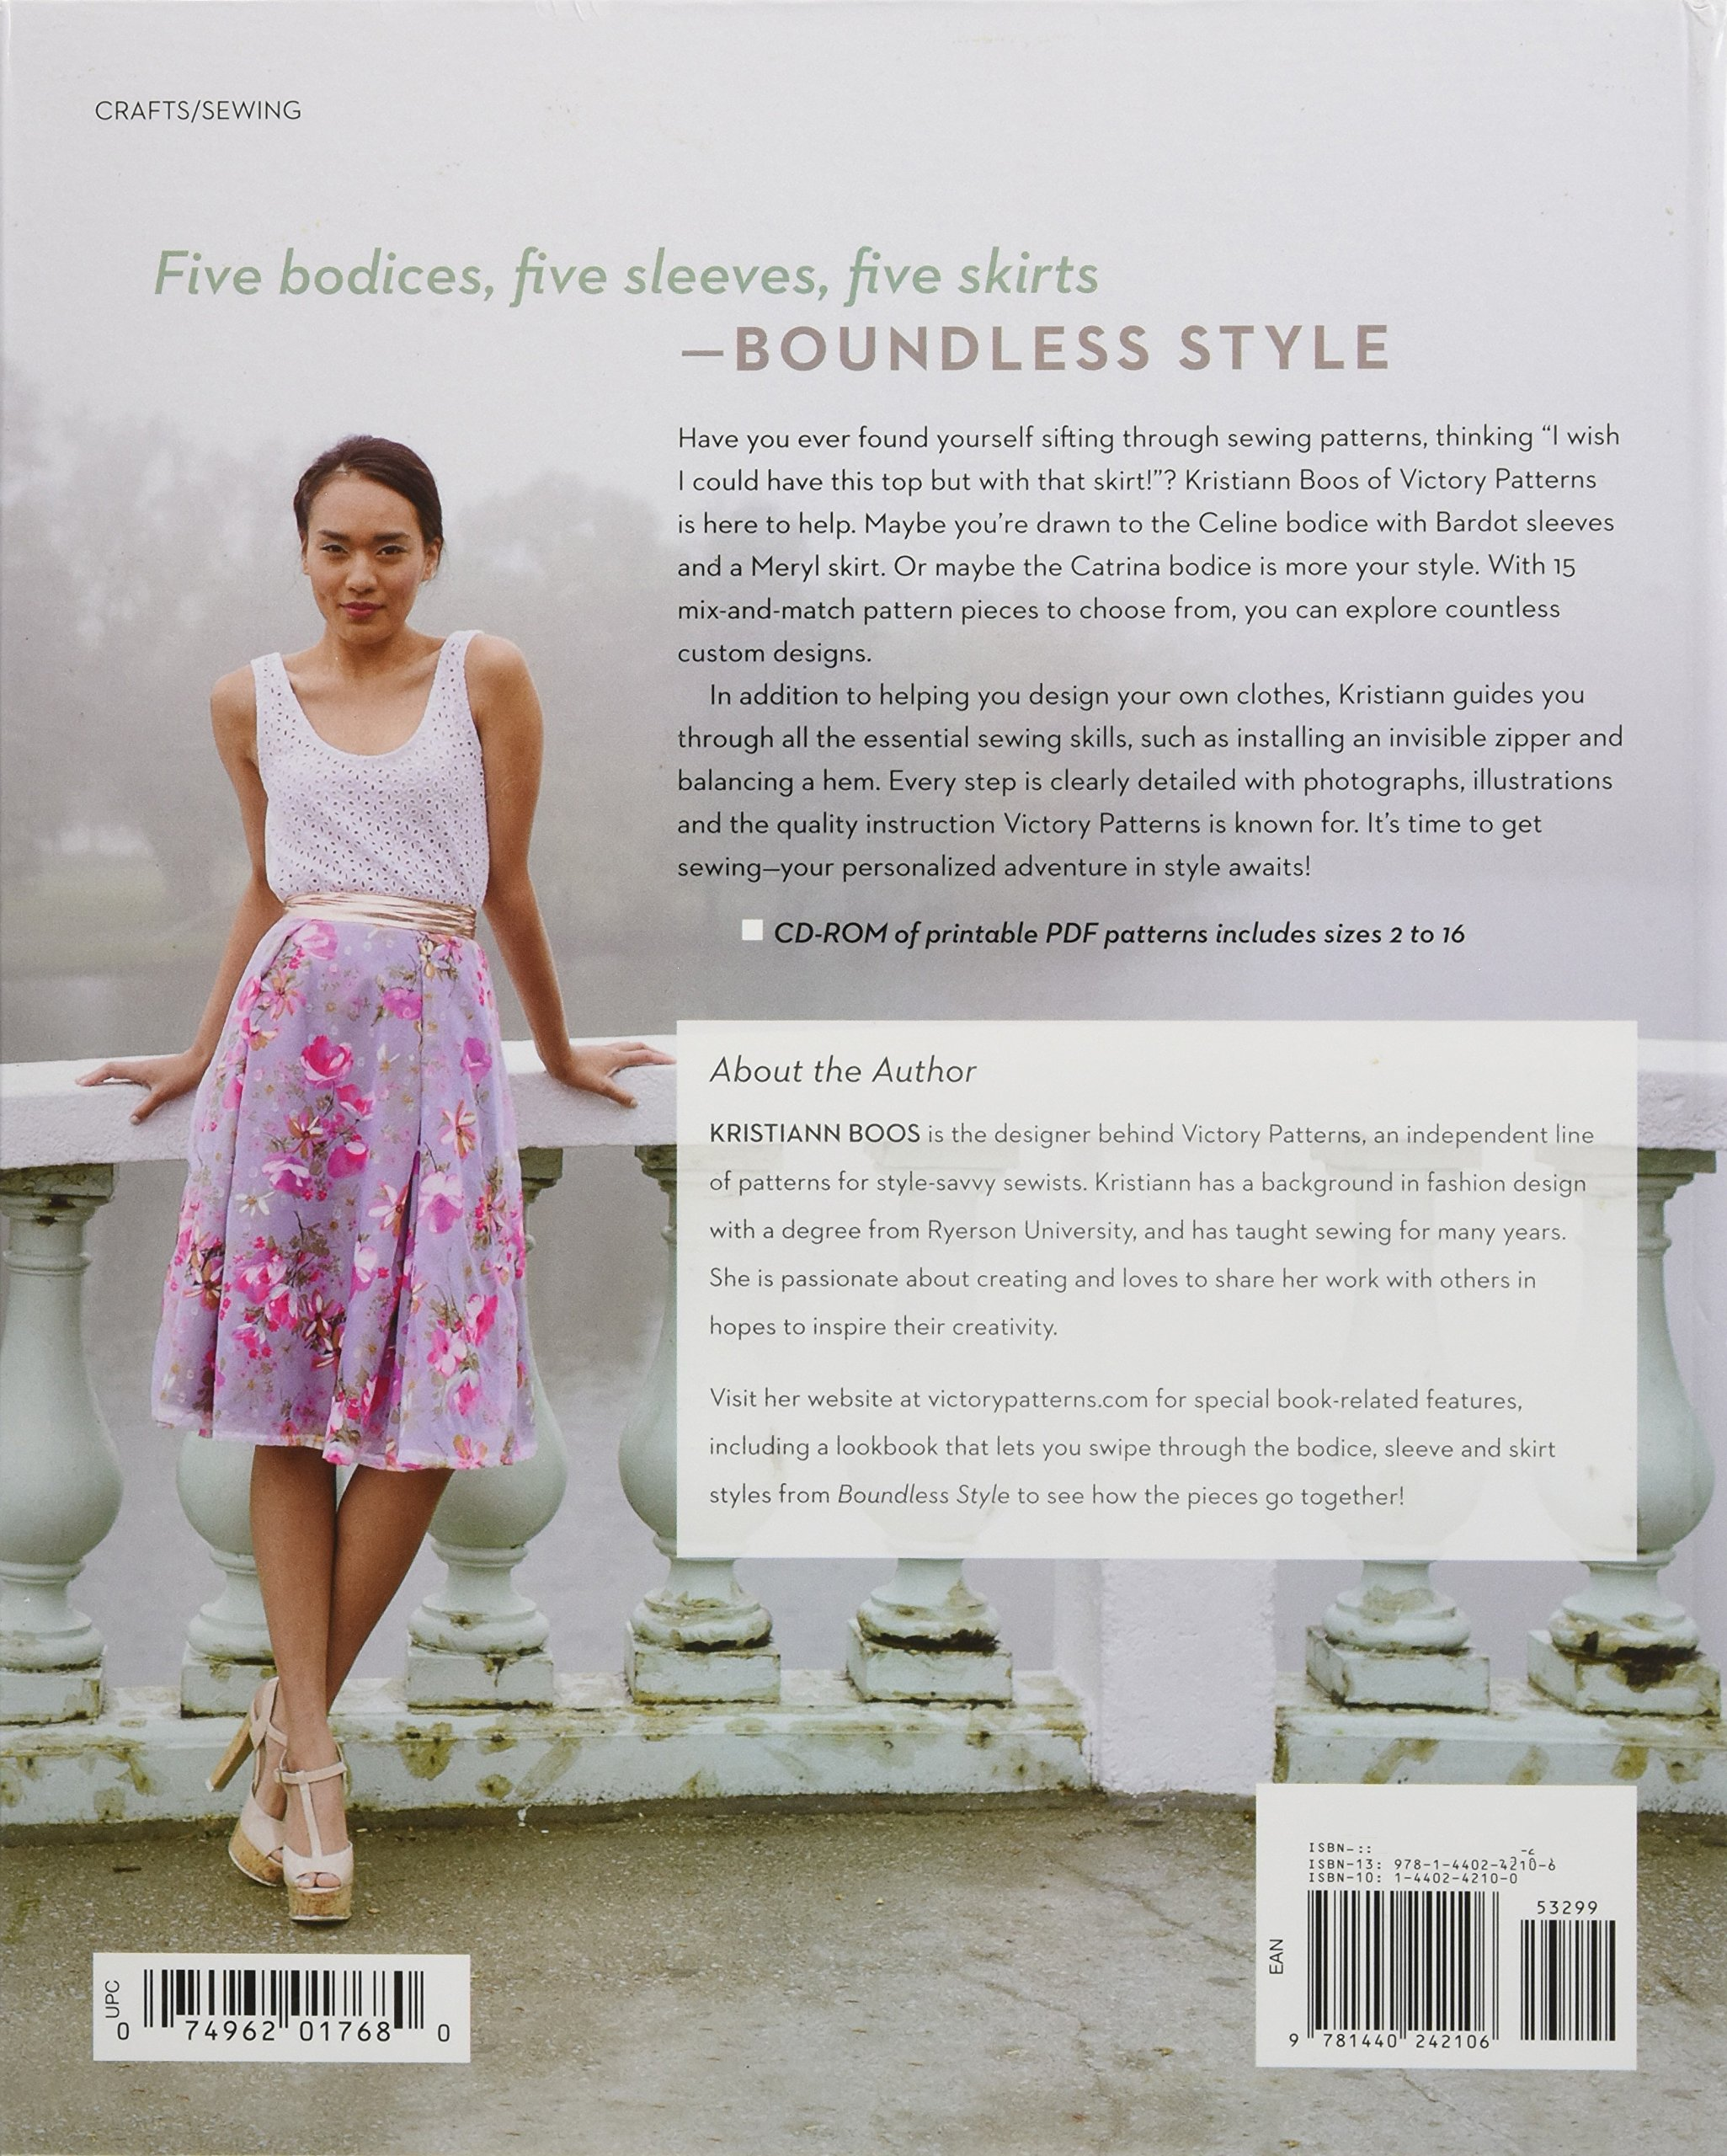 Boundless Style A Mix And Match Sewing Pattern Workbook Boos Kristiann 9781440242106 Amazon Com Books